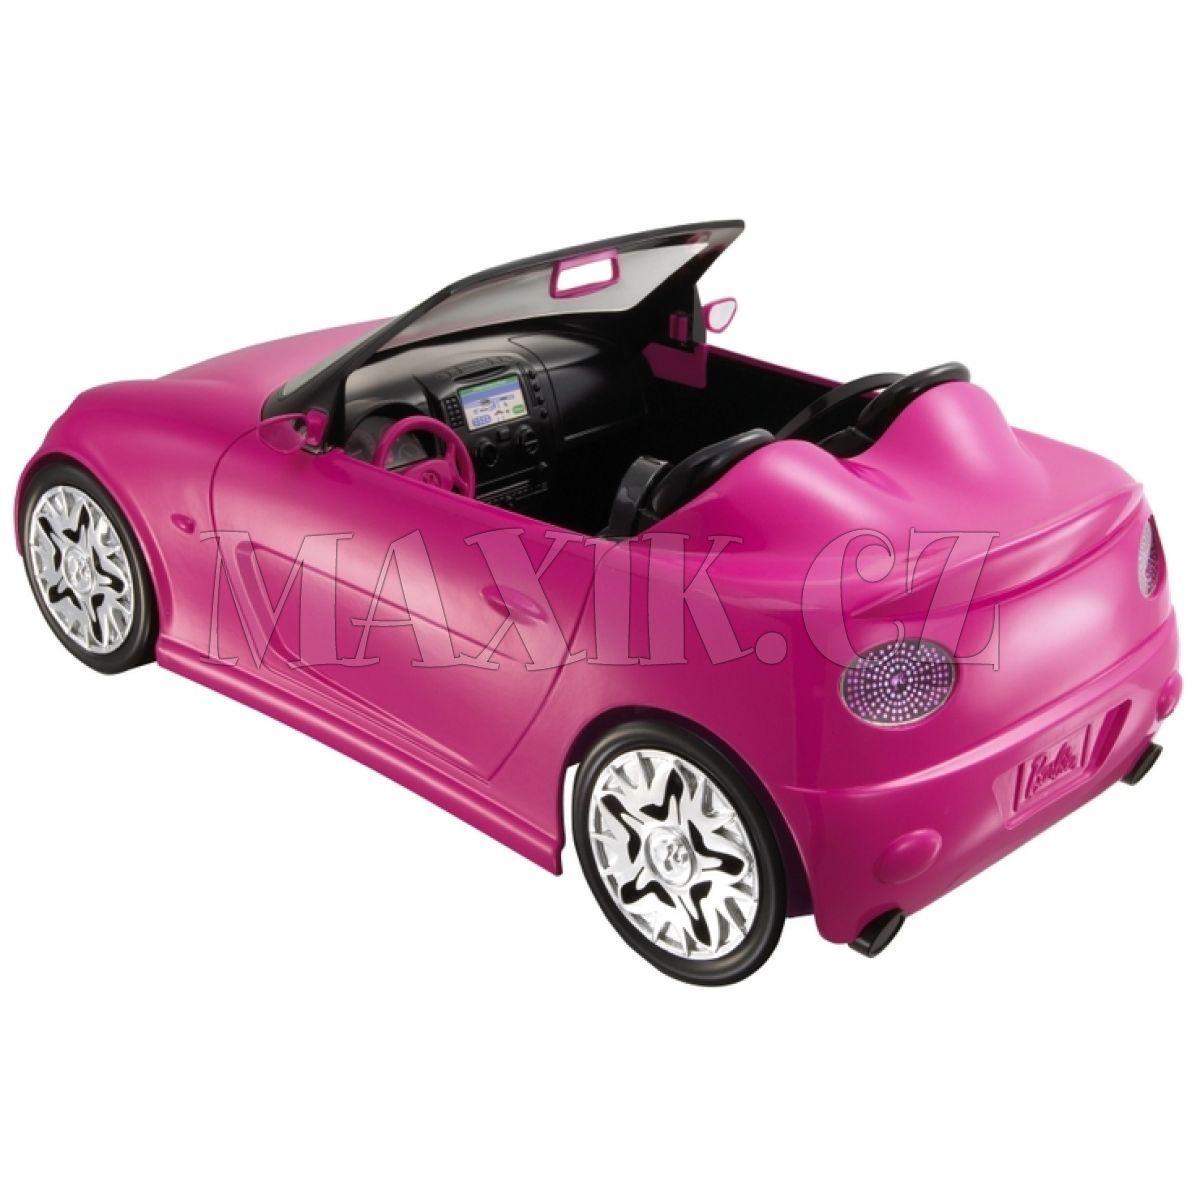 barbie auto r4205 max kovy hra ky. Black Bedroom Furniture Sets. Home Design Ideas